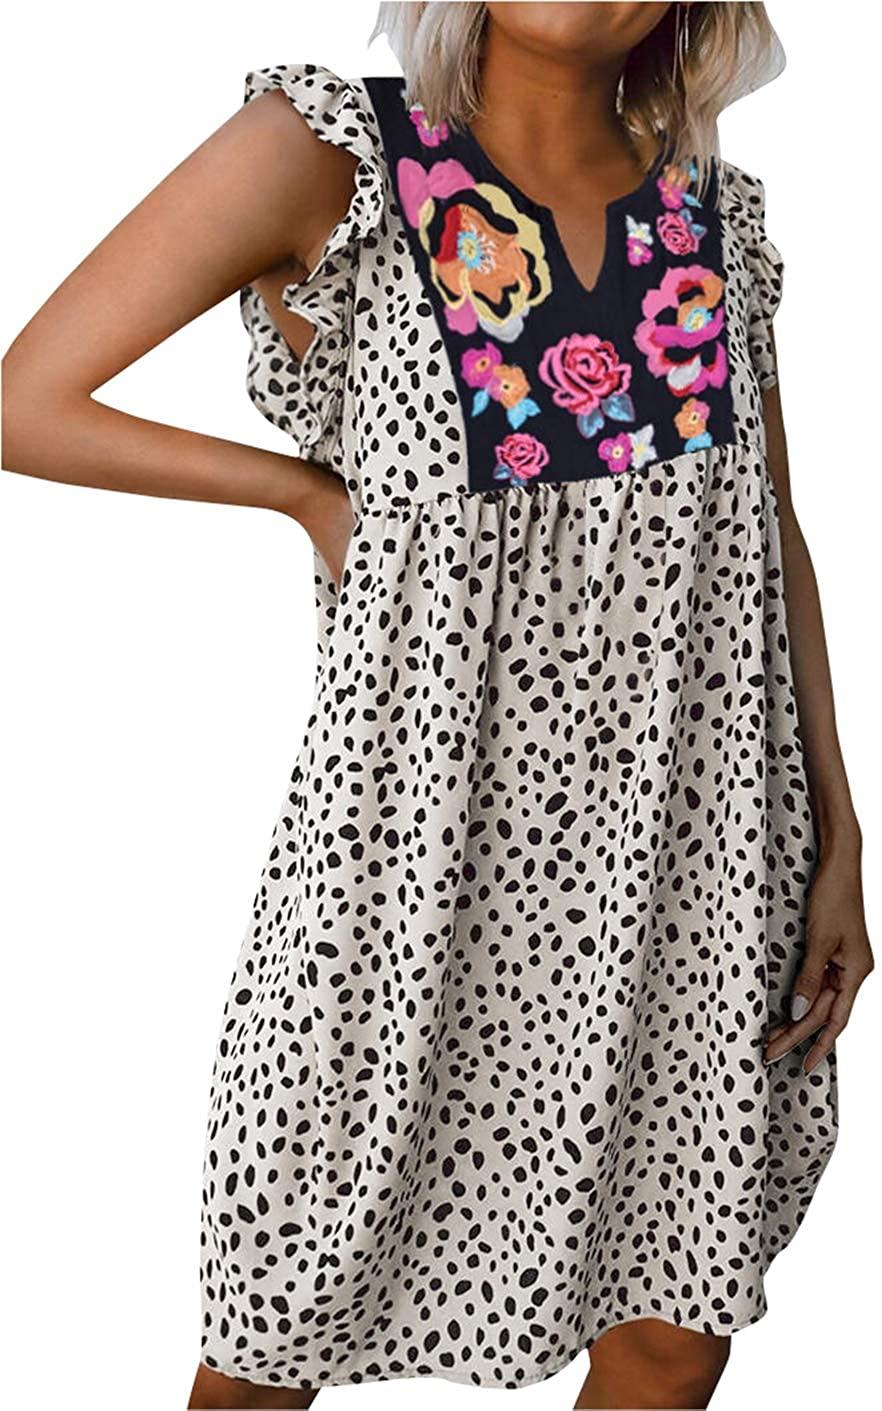 Women Spotted V Neck Mini Dress Floral Graphic Leopard Print Polka Dot Ruffle Swing Sundress Casual Beach Tank Dress